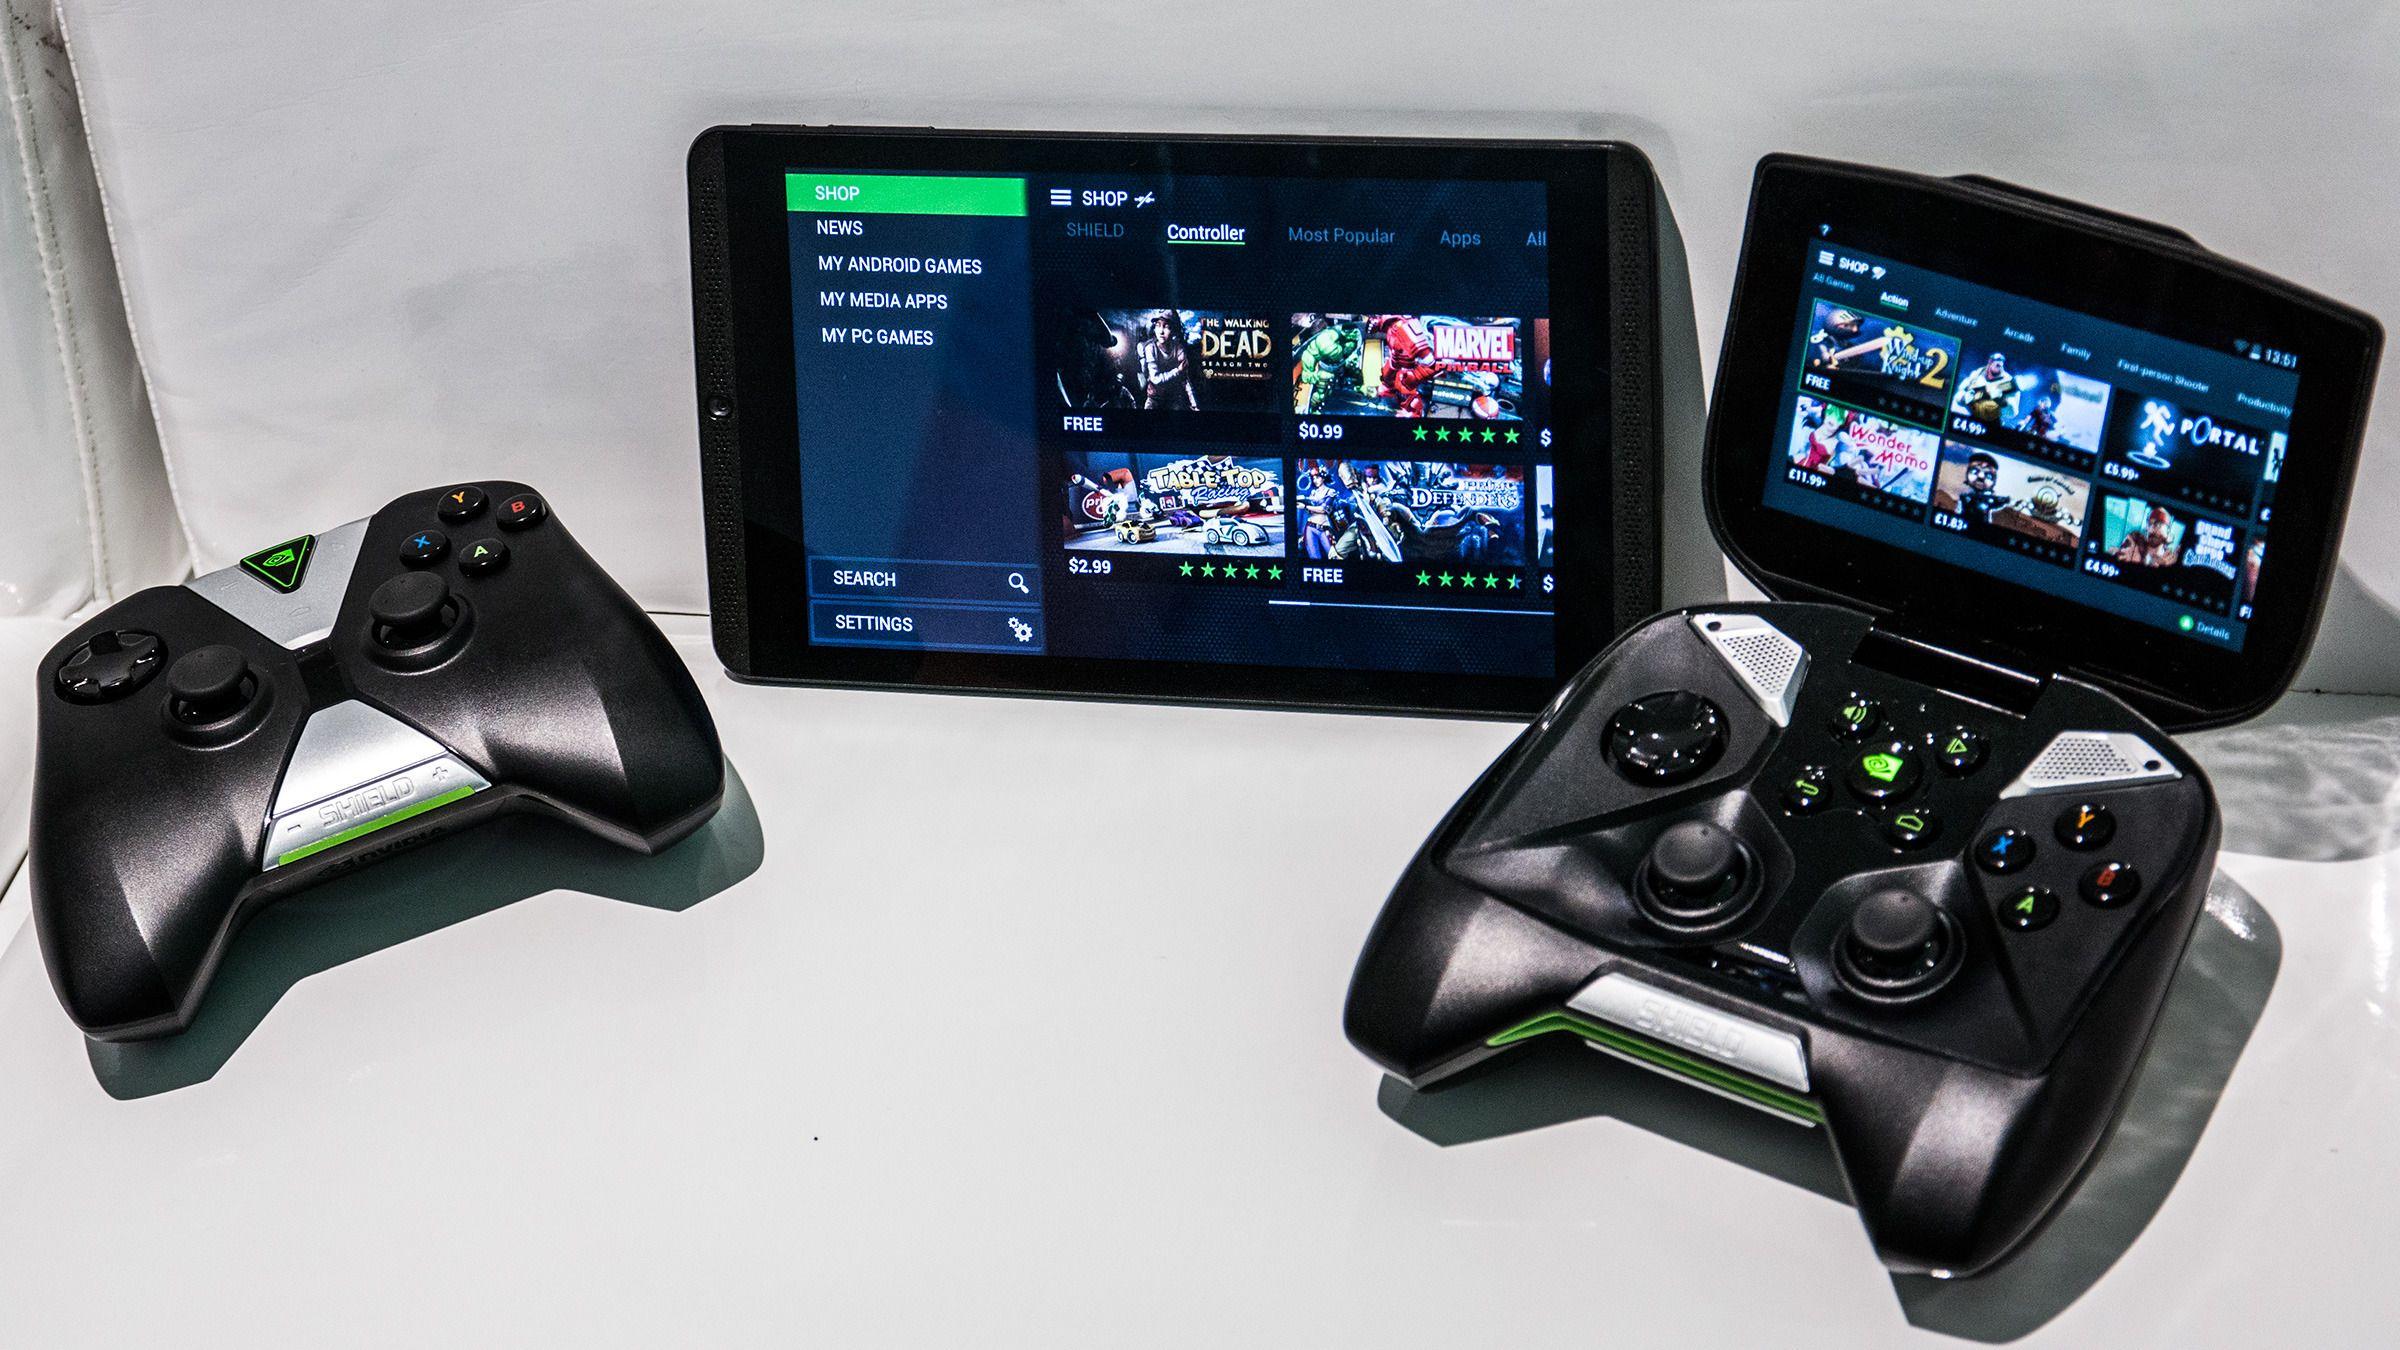 Sammenliknet med bestefar Shield, har Shield Tablet en rekke finesser vi tror vi kan sette pris på.Foto: Varg Aamo, Hardware.no